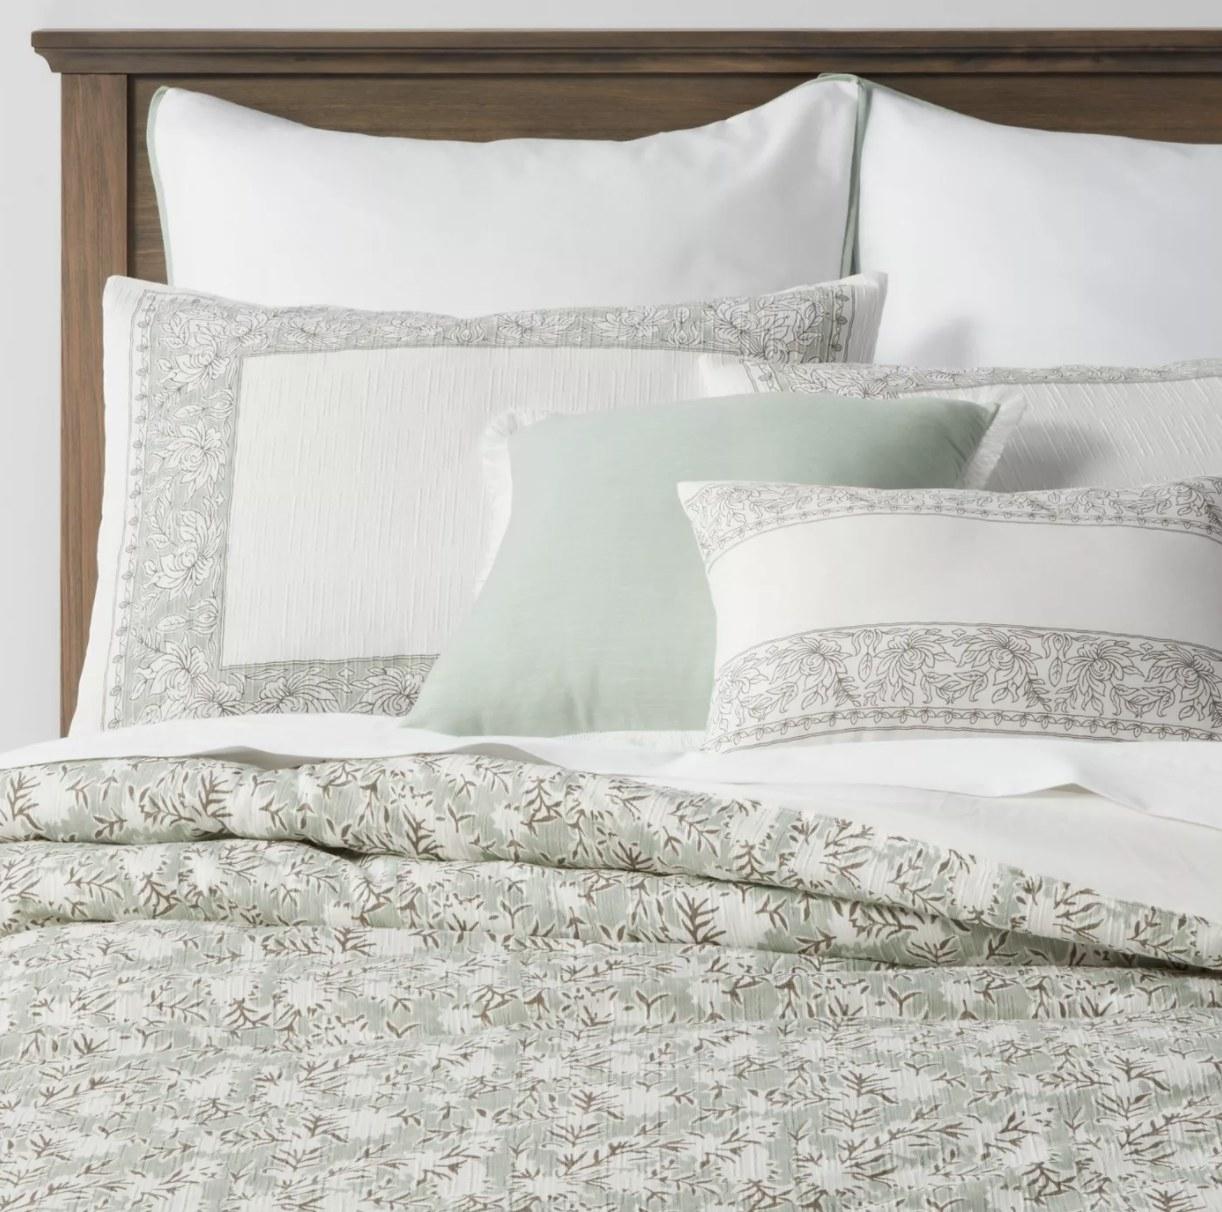 Floral comforter on bed